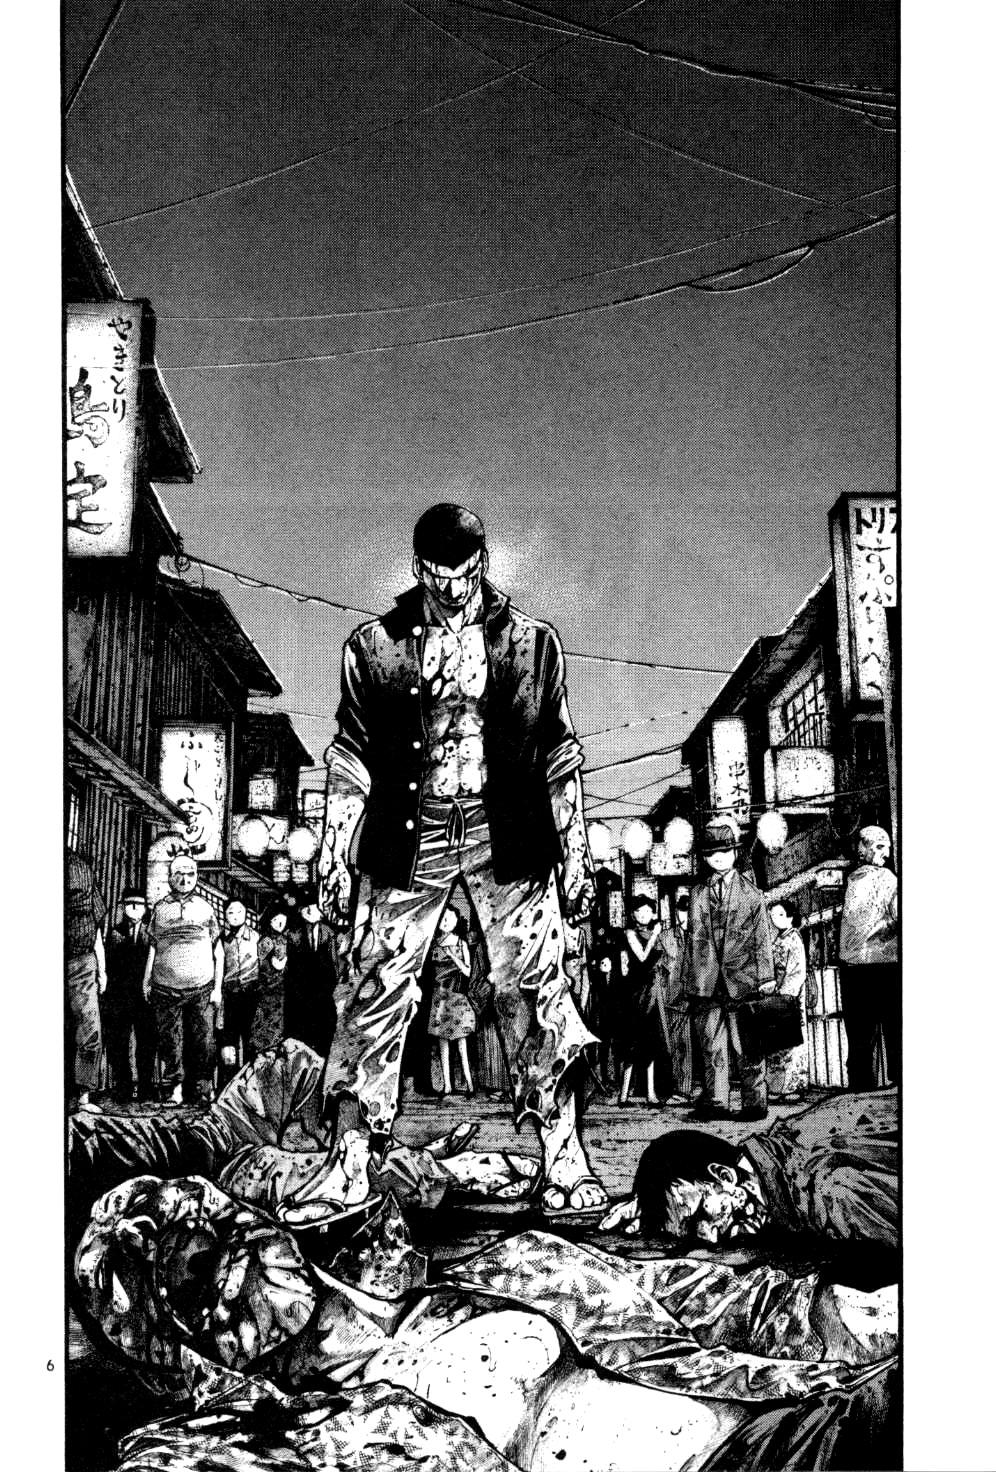 https://r2.ninemanga.com/comics/pic3/55/35447/1277589/1542453746913.jpg Page 17